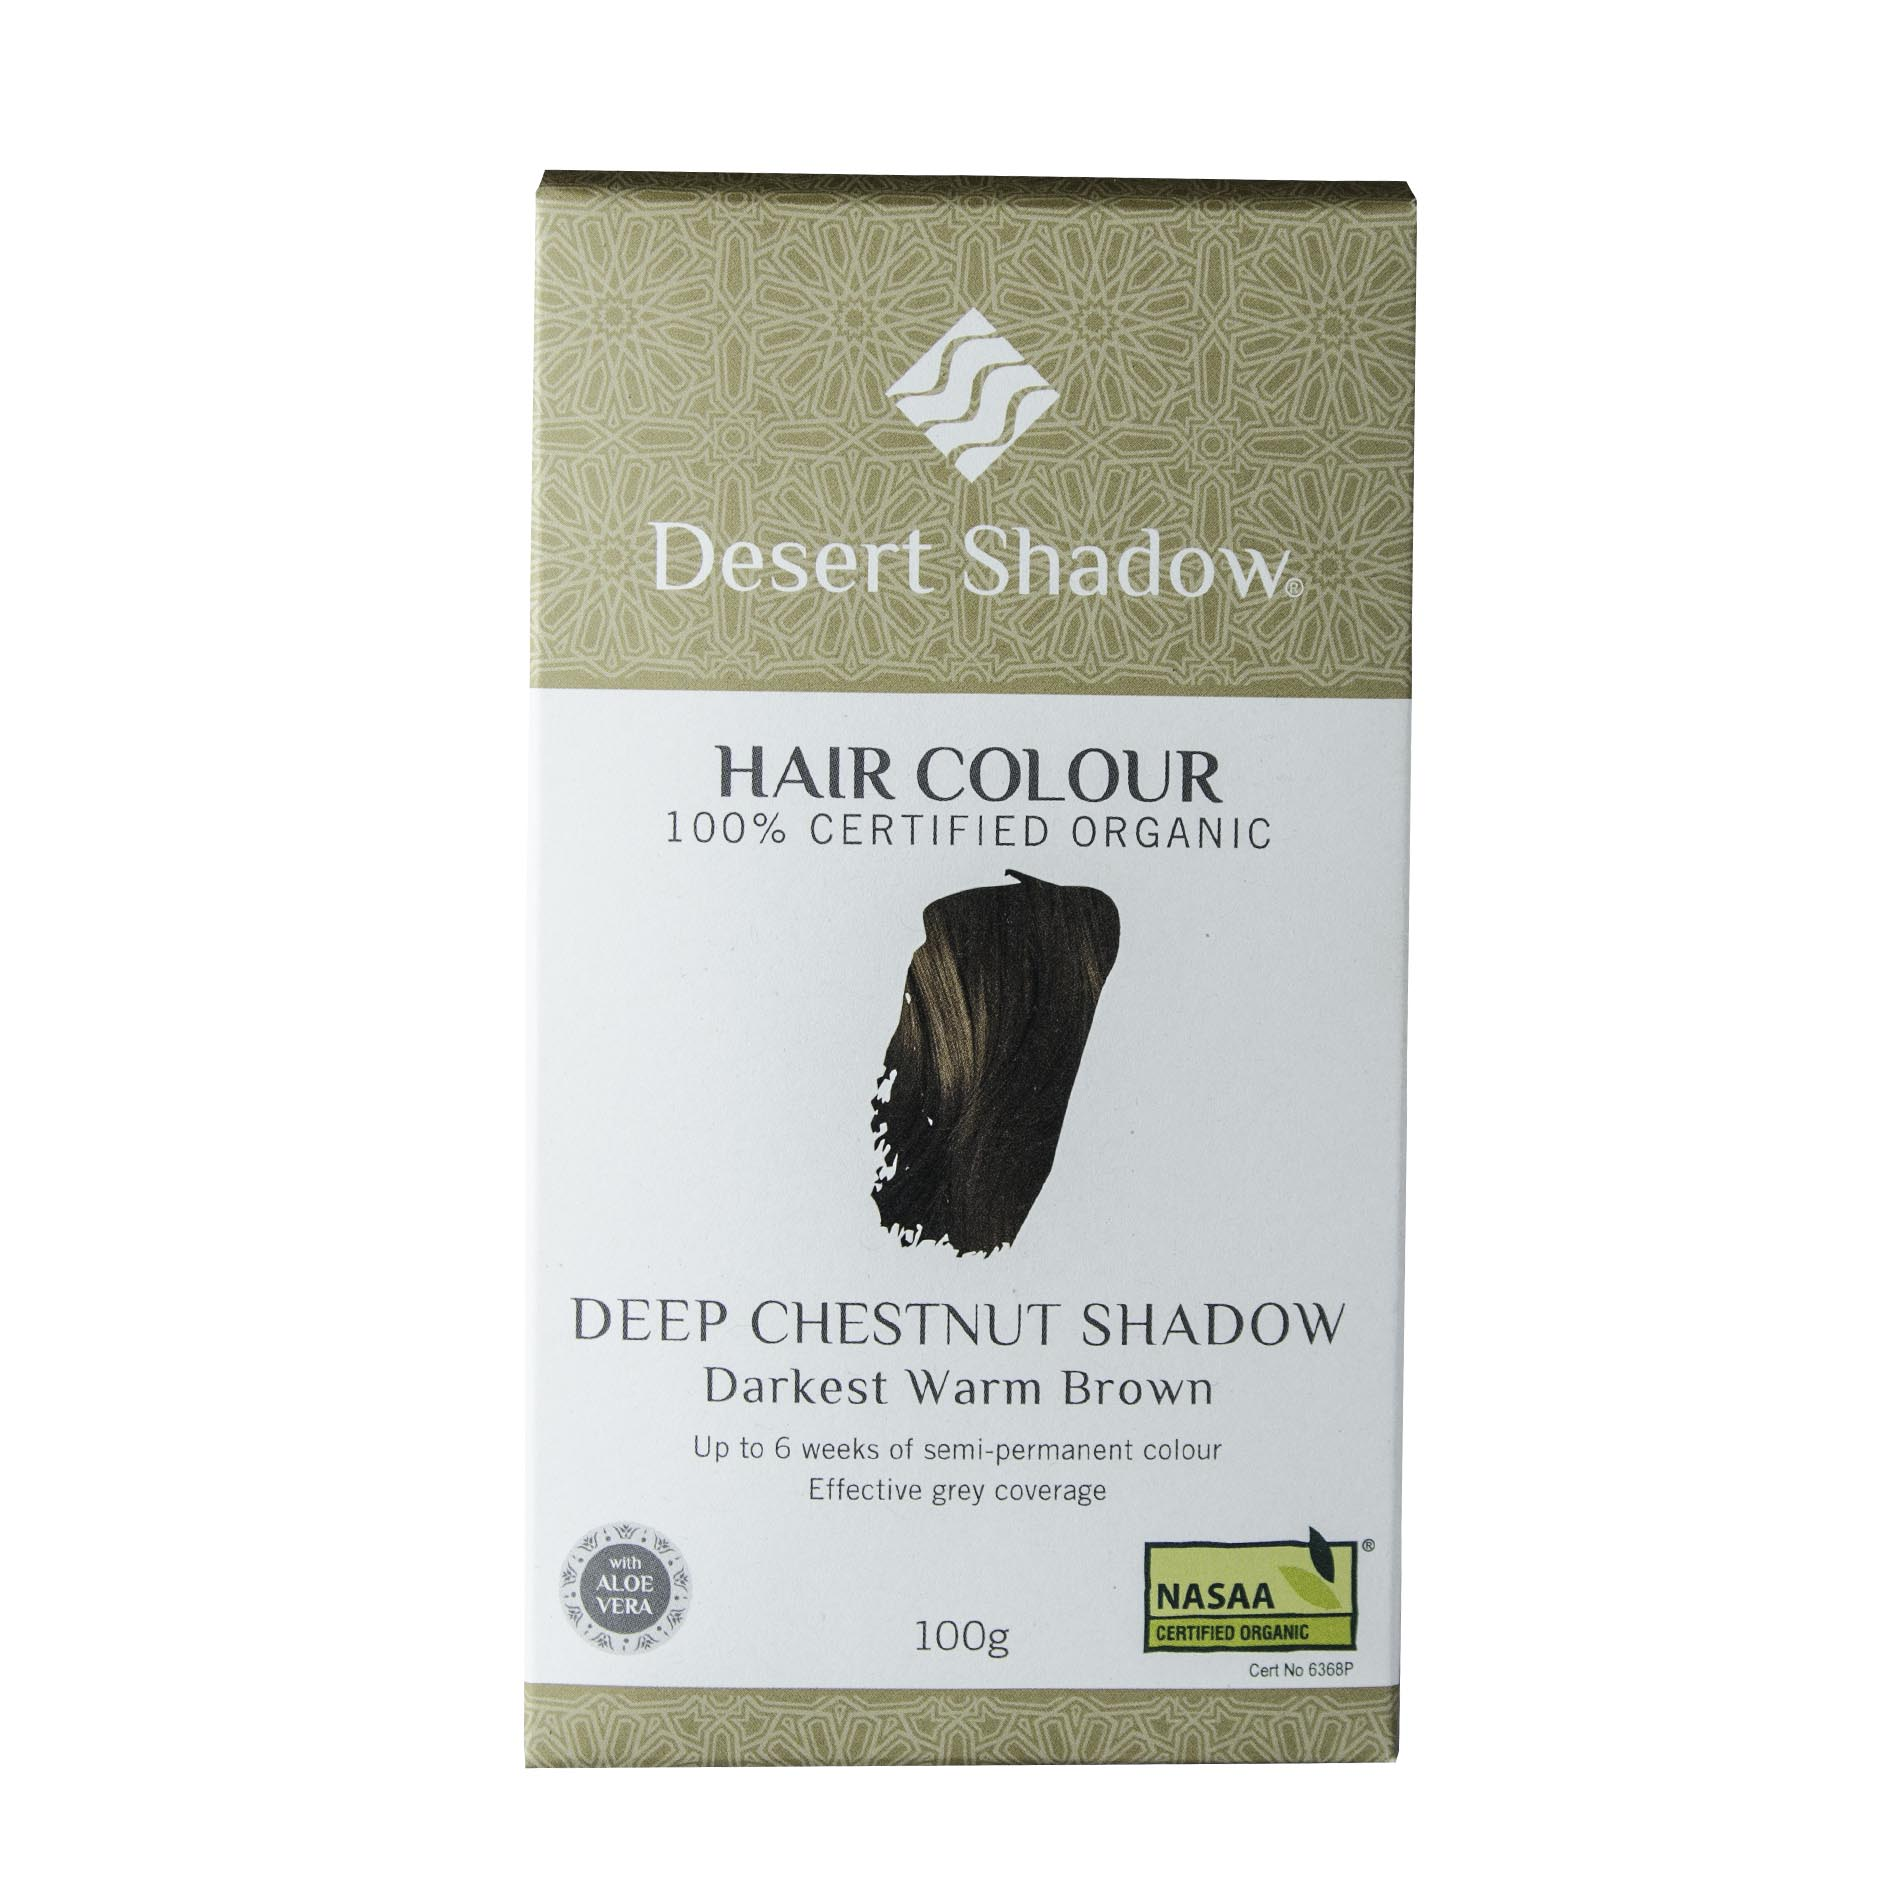 Desert Shadow Organic Hair Dye Deep Chestnut Shadow